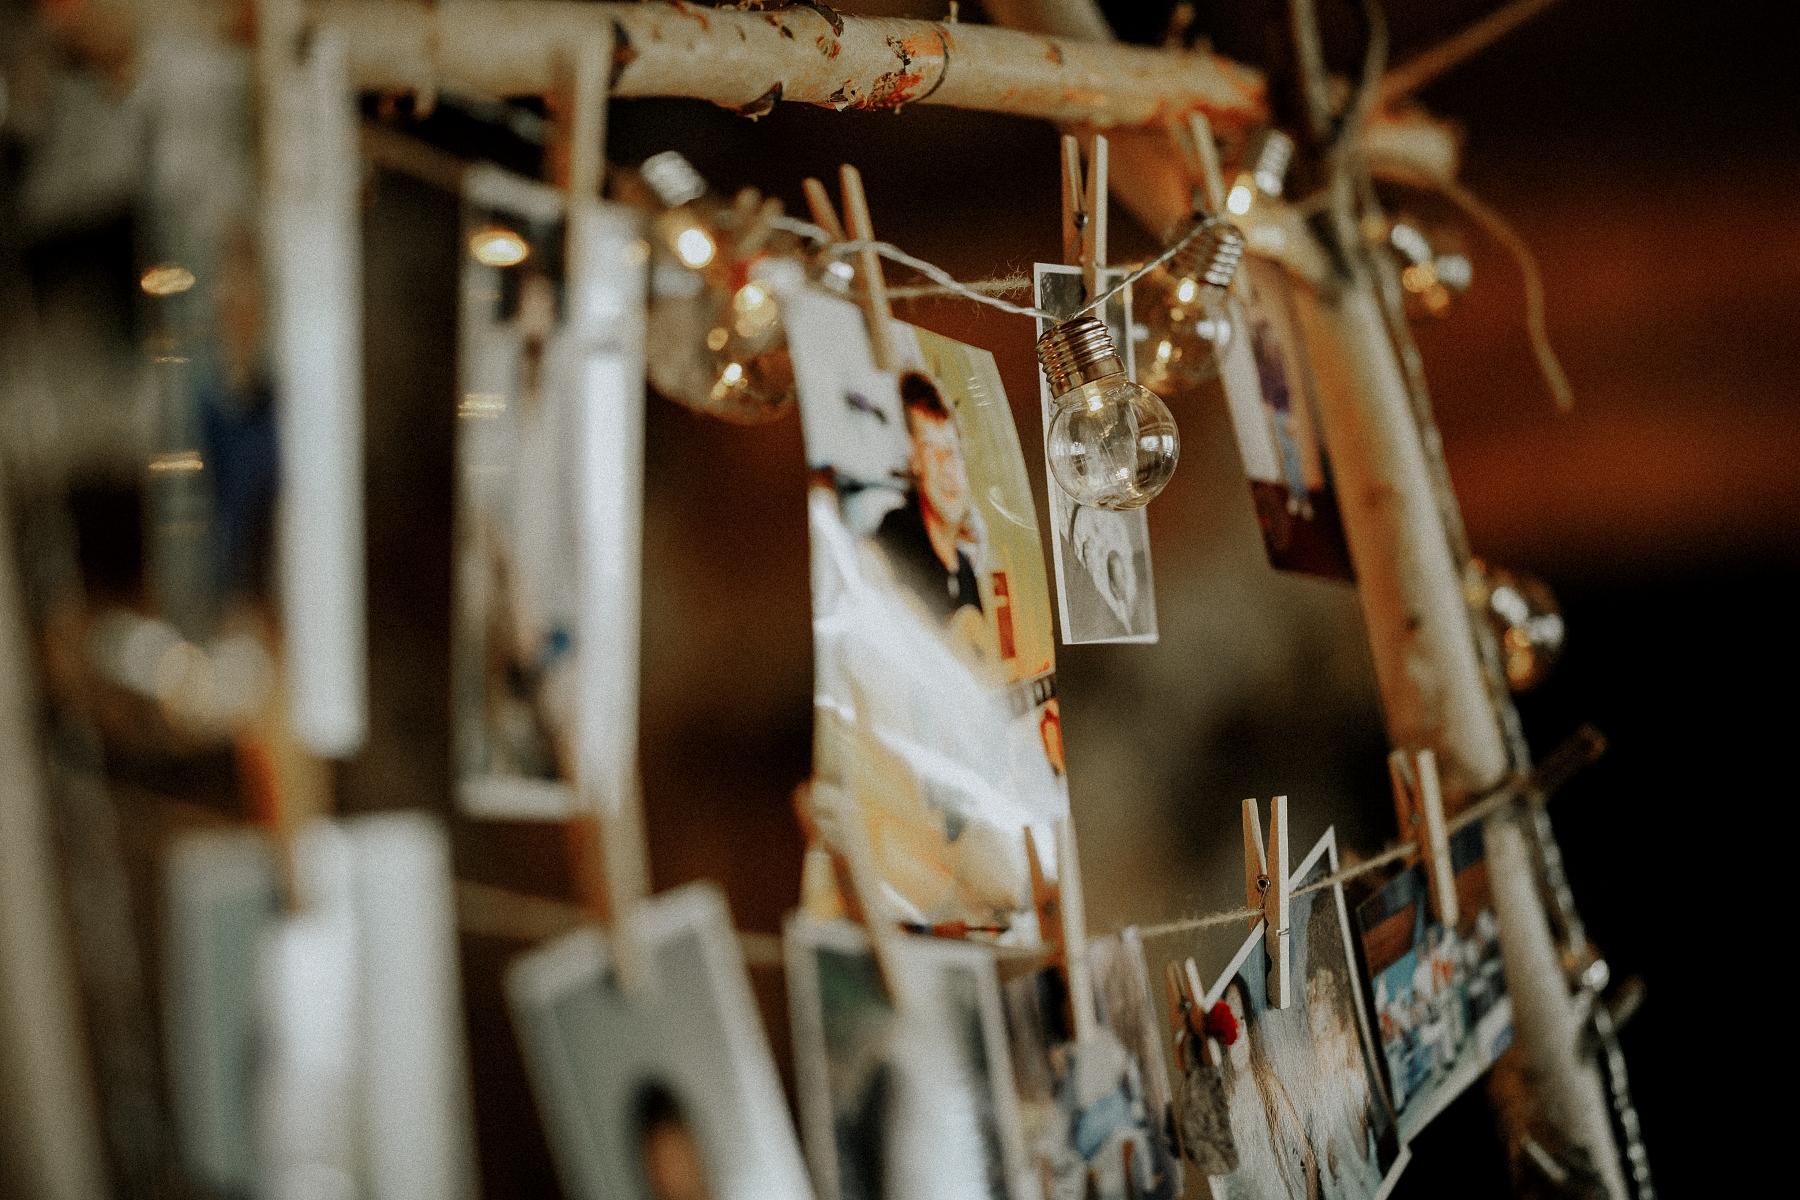 #fotografluboskrahulec @fotografluboskrahulec;best of wedding photos;Lubos Krahulec, svadobny fotograf, fotograf vychod, slovensko, slovakia, czech, europan, presov, wedding, natural wedding portrait, best wedding photo, asociacia slovenskych svadobnych fotografov, cech fotografov, fotograf krahulec, ;najlepsi fotograf;poprad;presov;stuzkova;svadba na slovensku ;svadobne fotky v prirode;svadobny fotograf